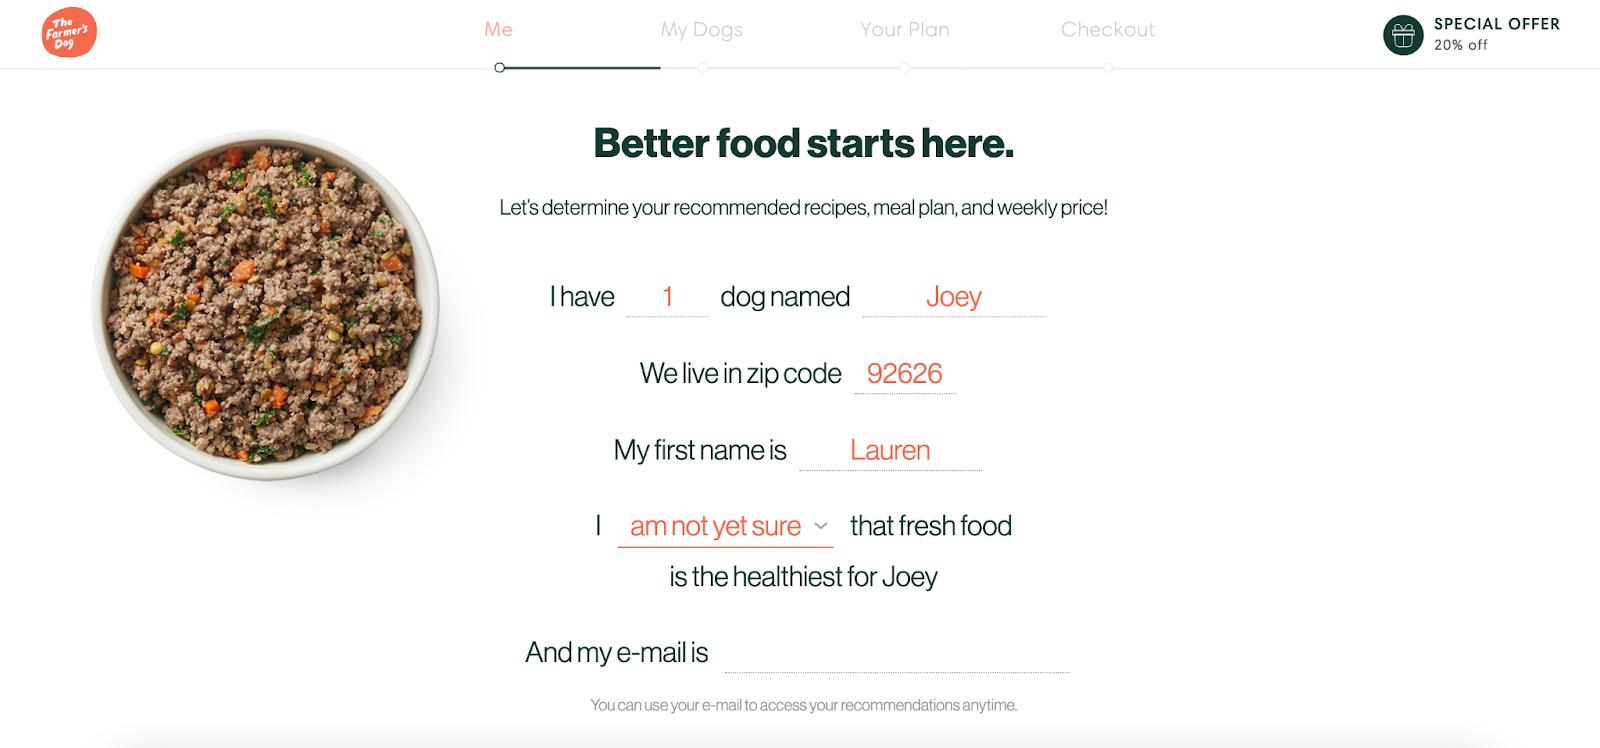 The Farmer's Dog email CTA